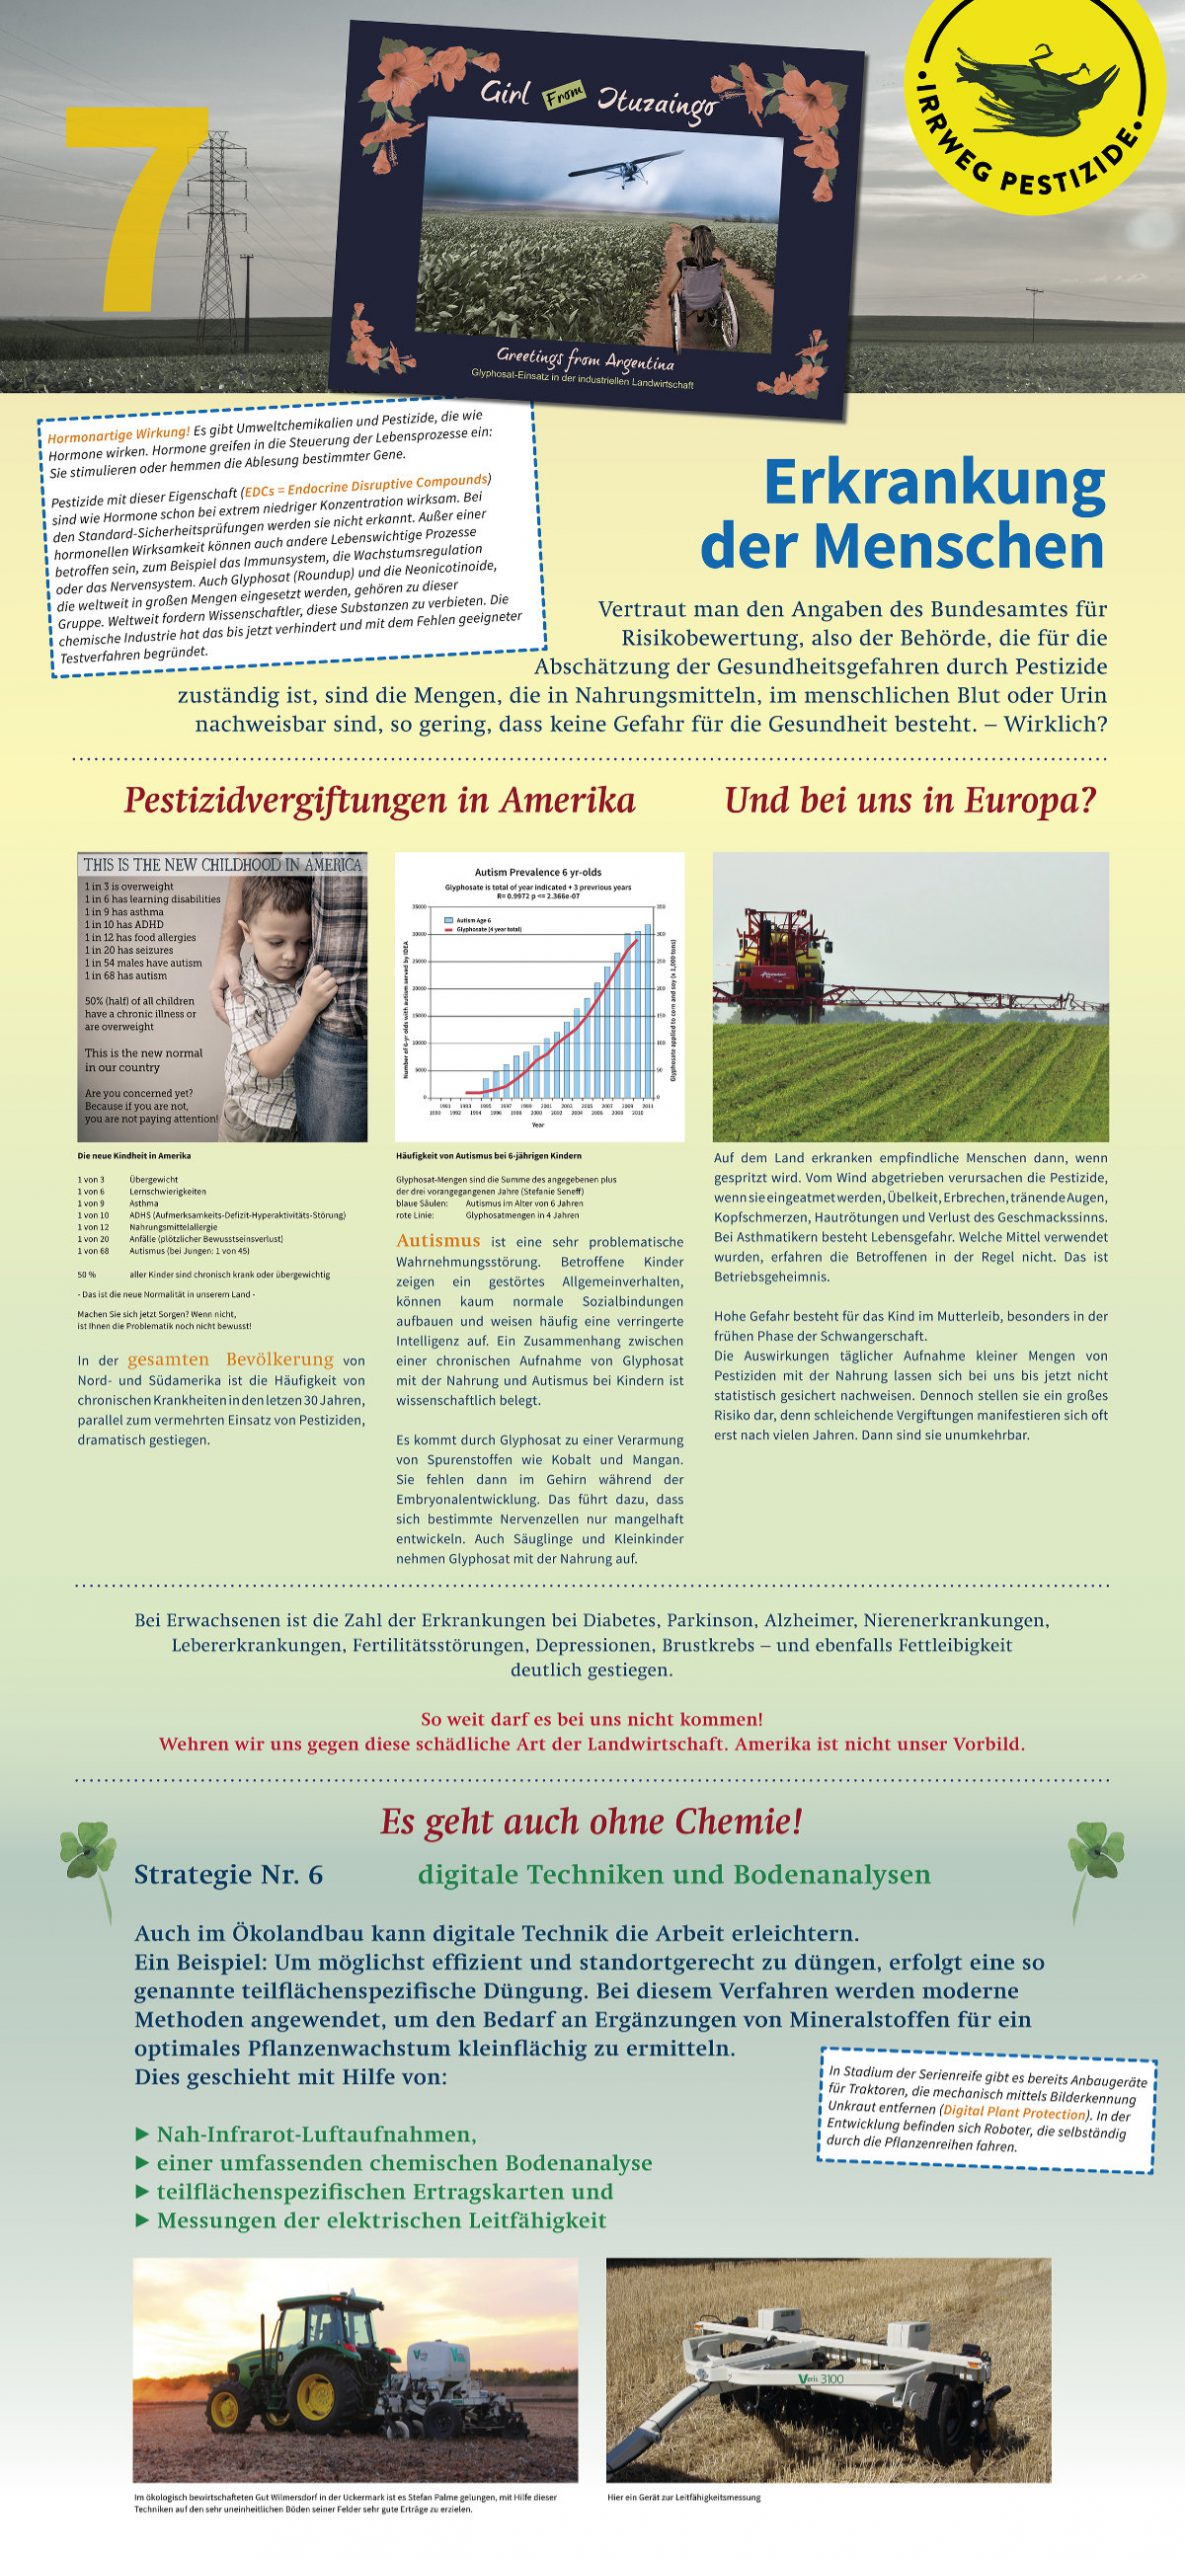 Irrweg Pestizide Erkrankung des Menschen